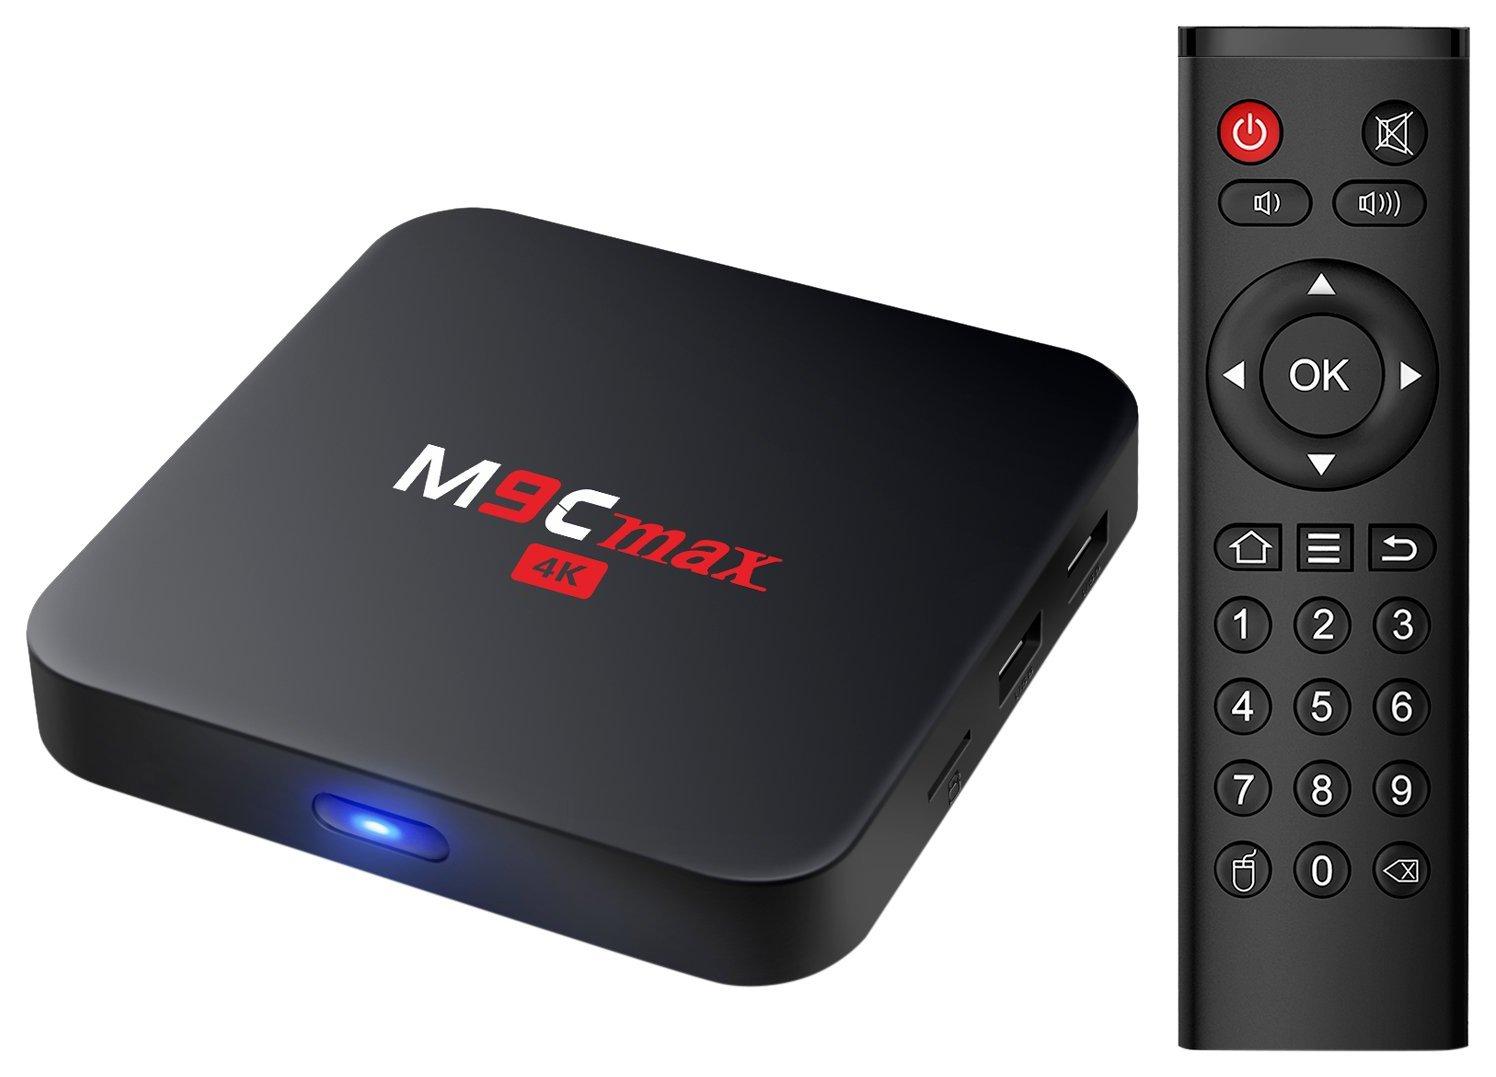 Bqeel M9C max Android 6.0 Marshmallow Amlogic S905X Chipset [2G DDR3/16G eMMC] 4K android tv box at $31.99 @Amazon